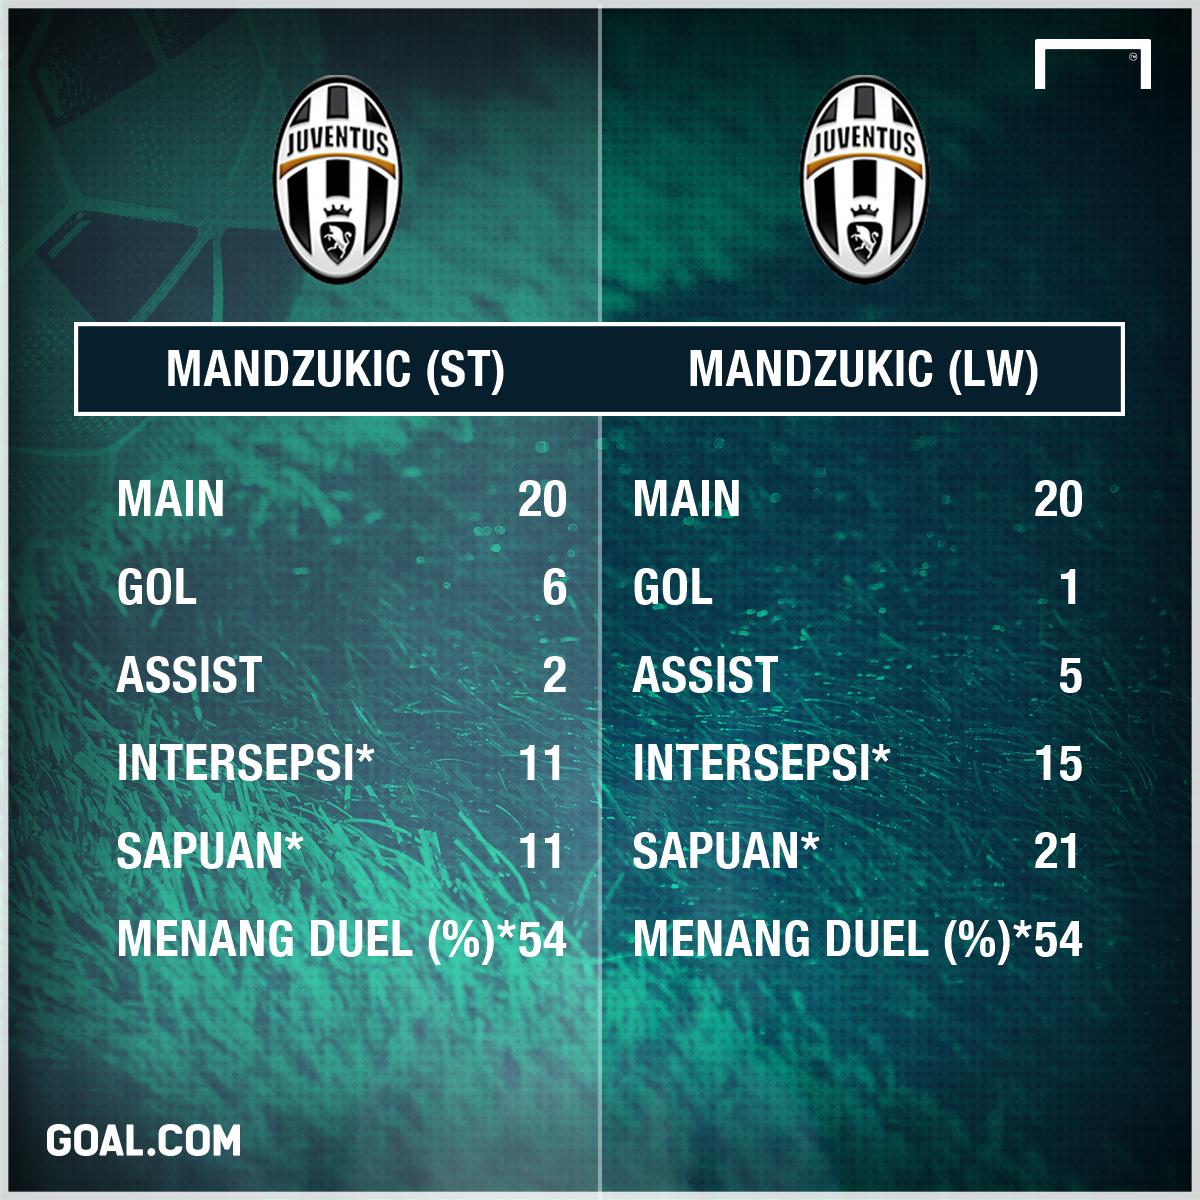 GFXID - Mario Mandzukic, Juventus